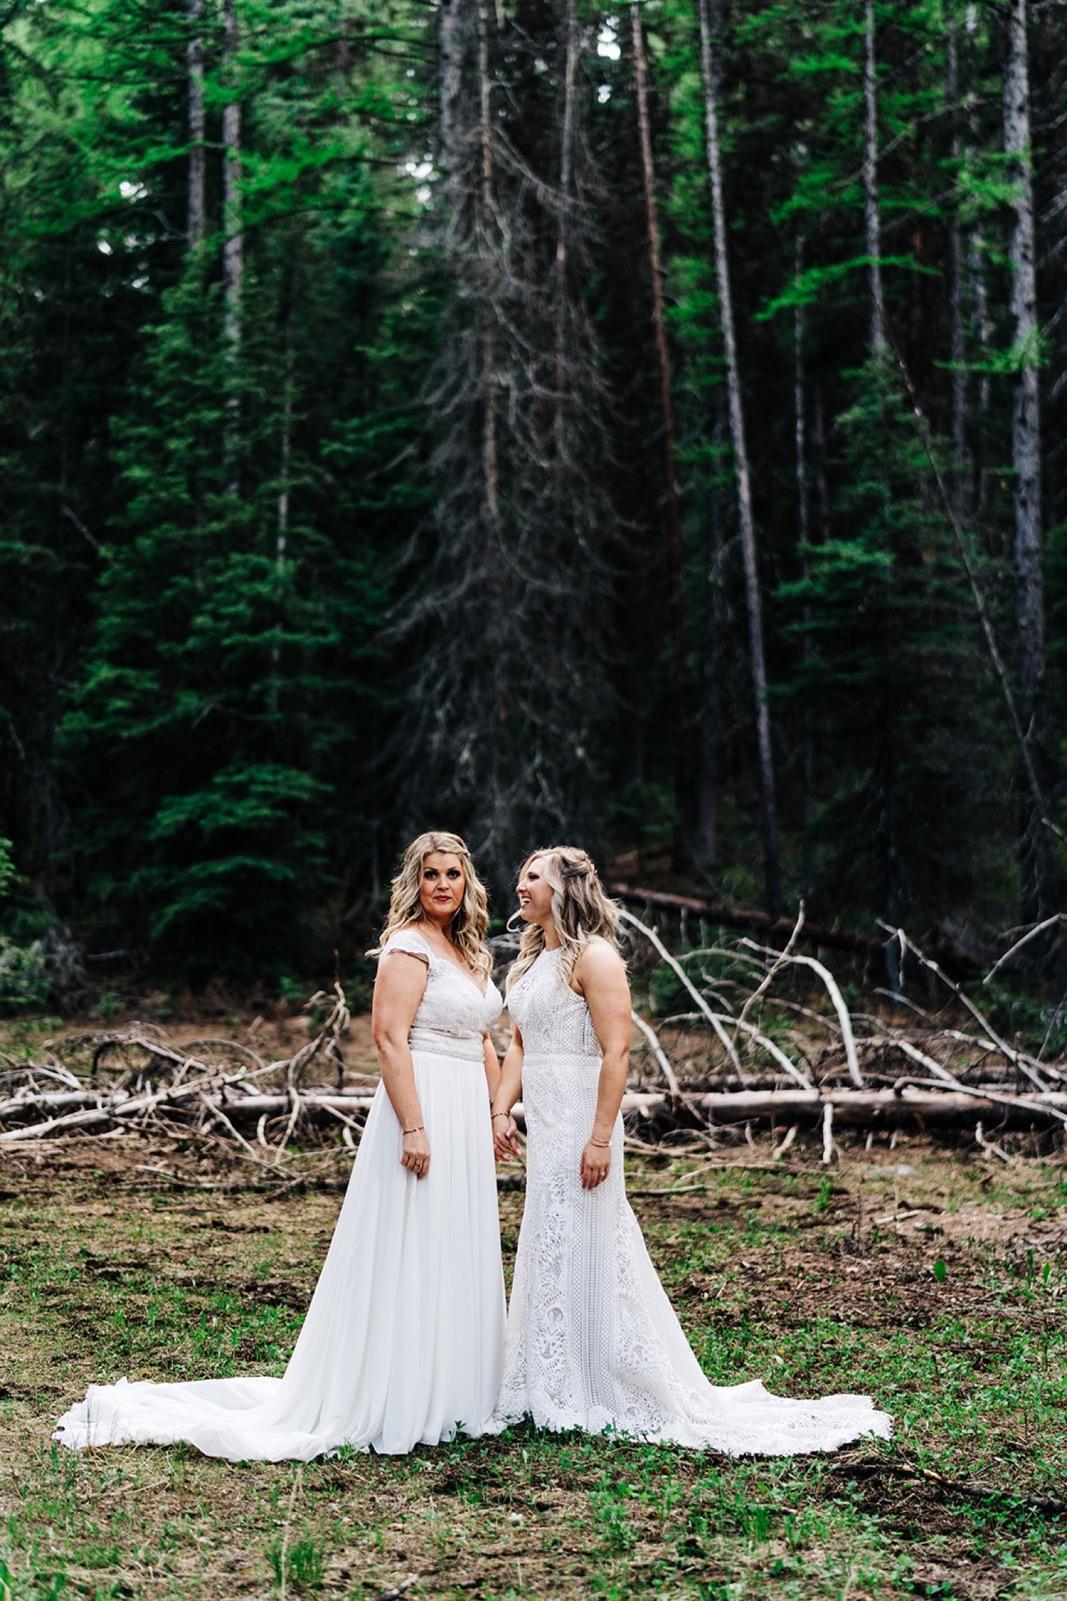 206_falissa_heather_wedding-564.jpg